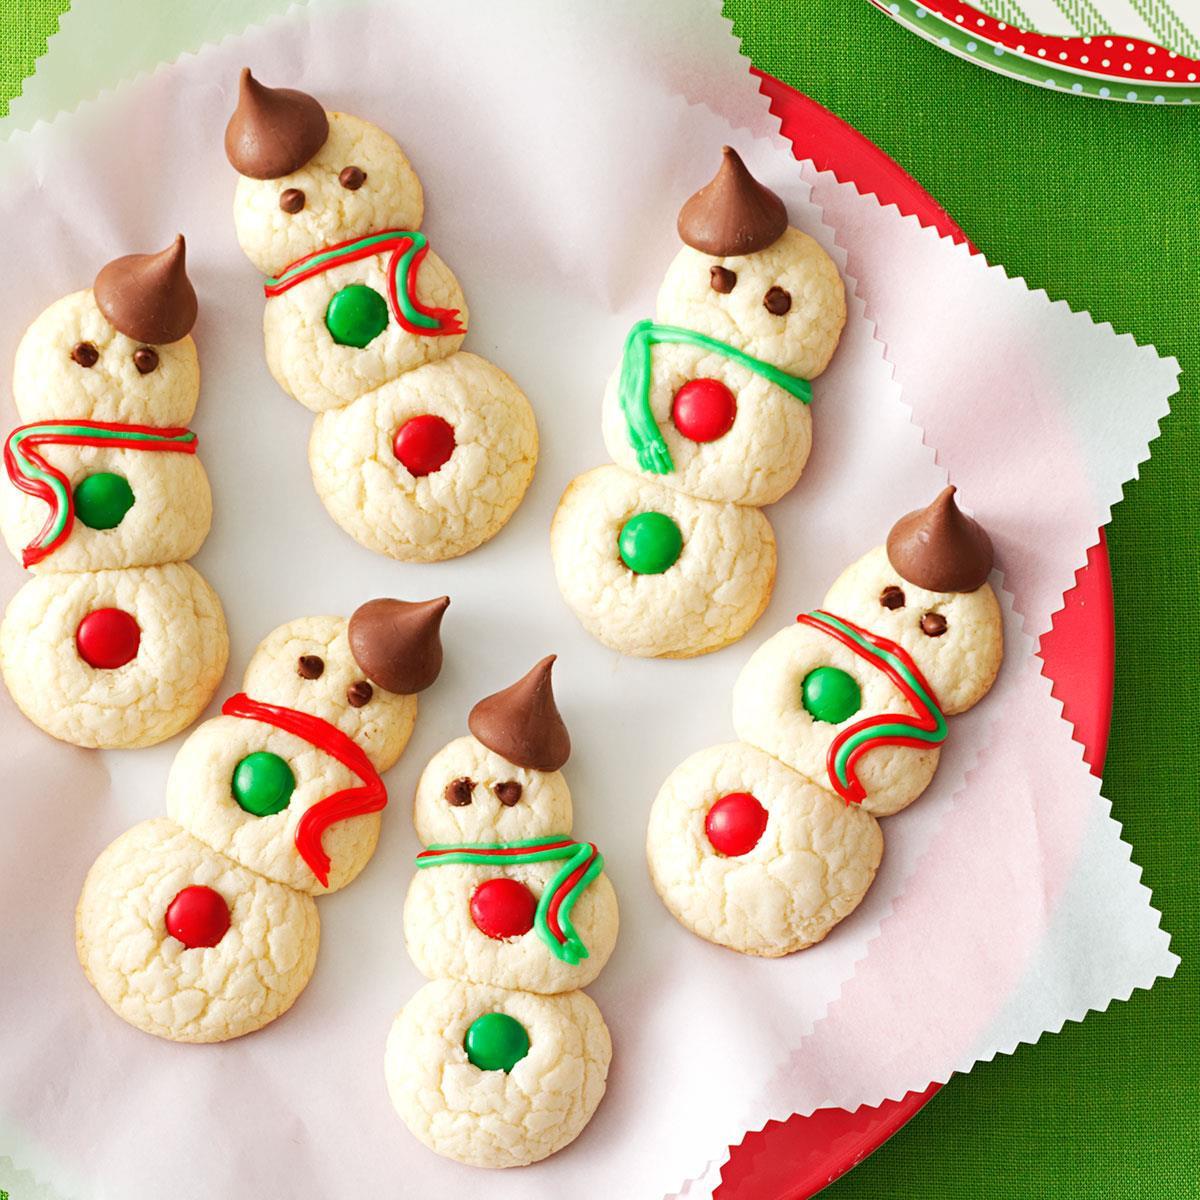 Christmas Baking Goods Recipes  Snowman Cookies Recipe